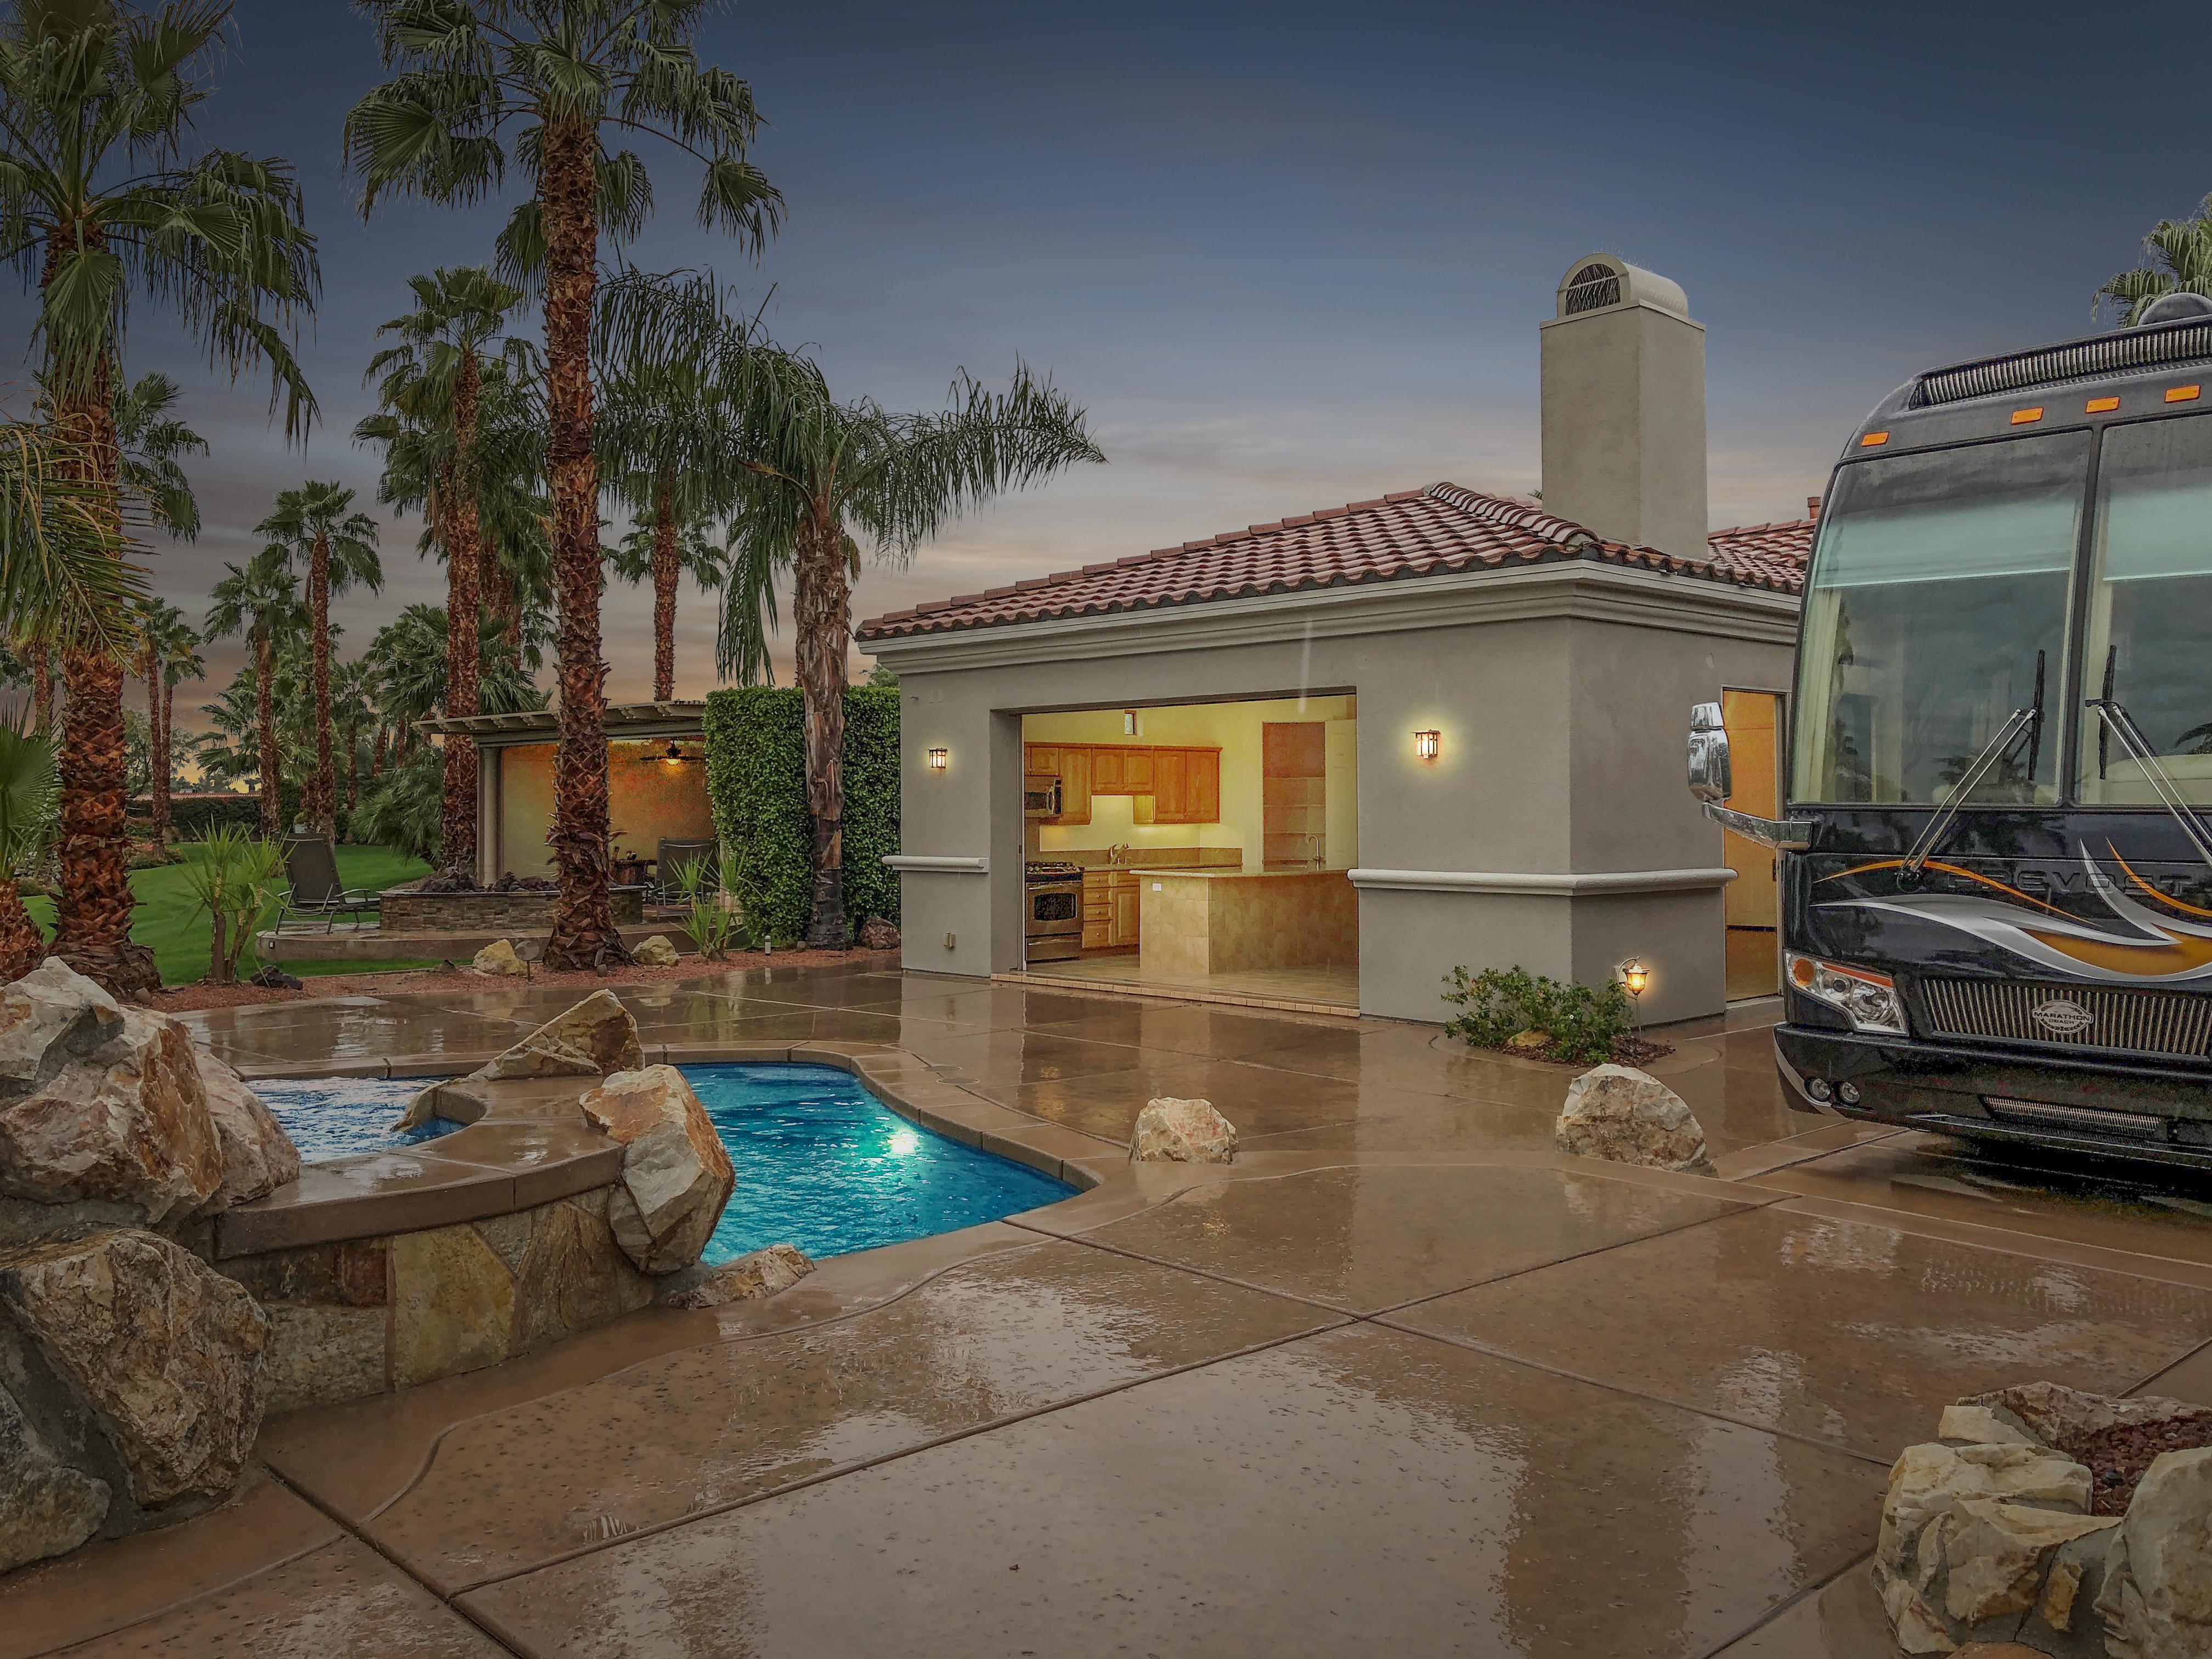 Lot 114 Desert Shores Motorcoach Resort